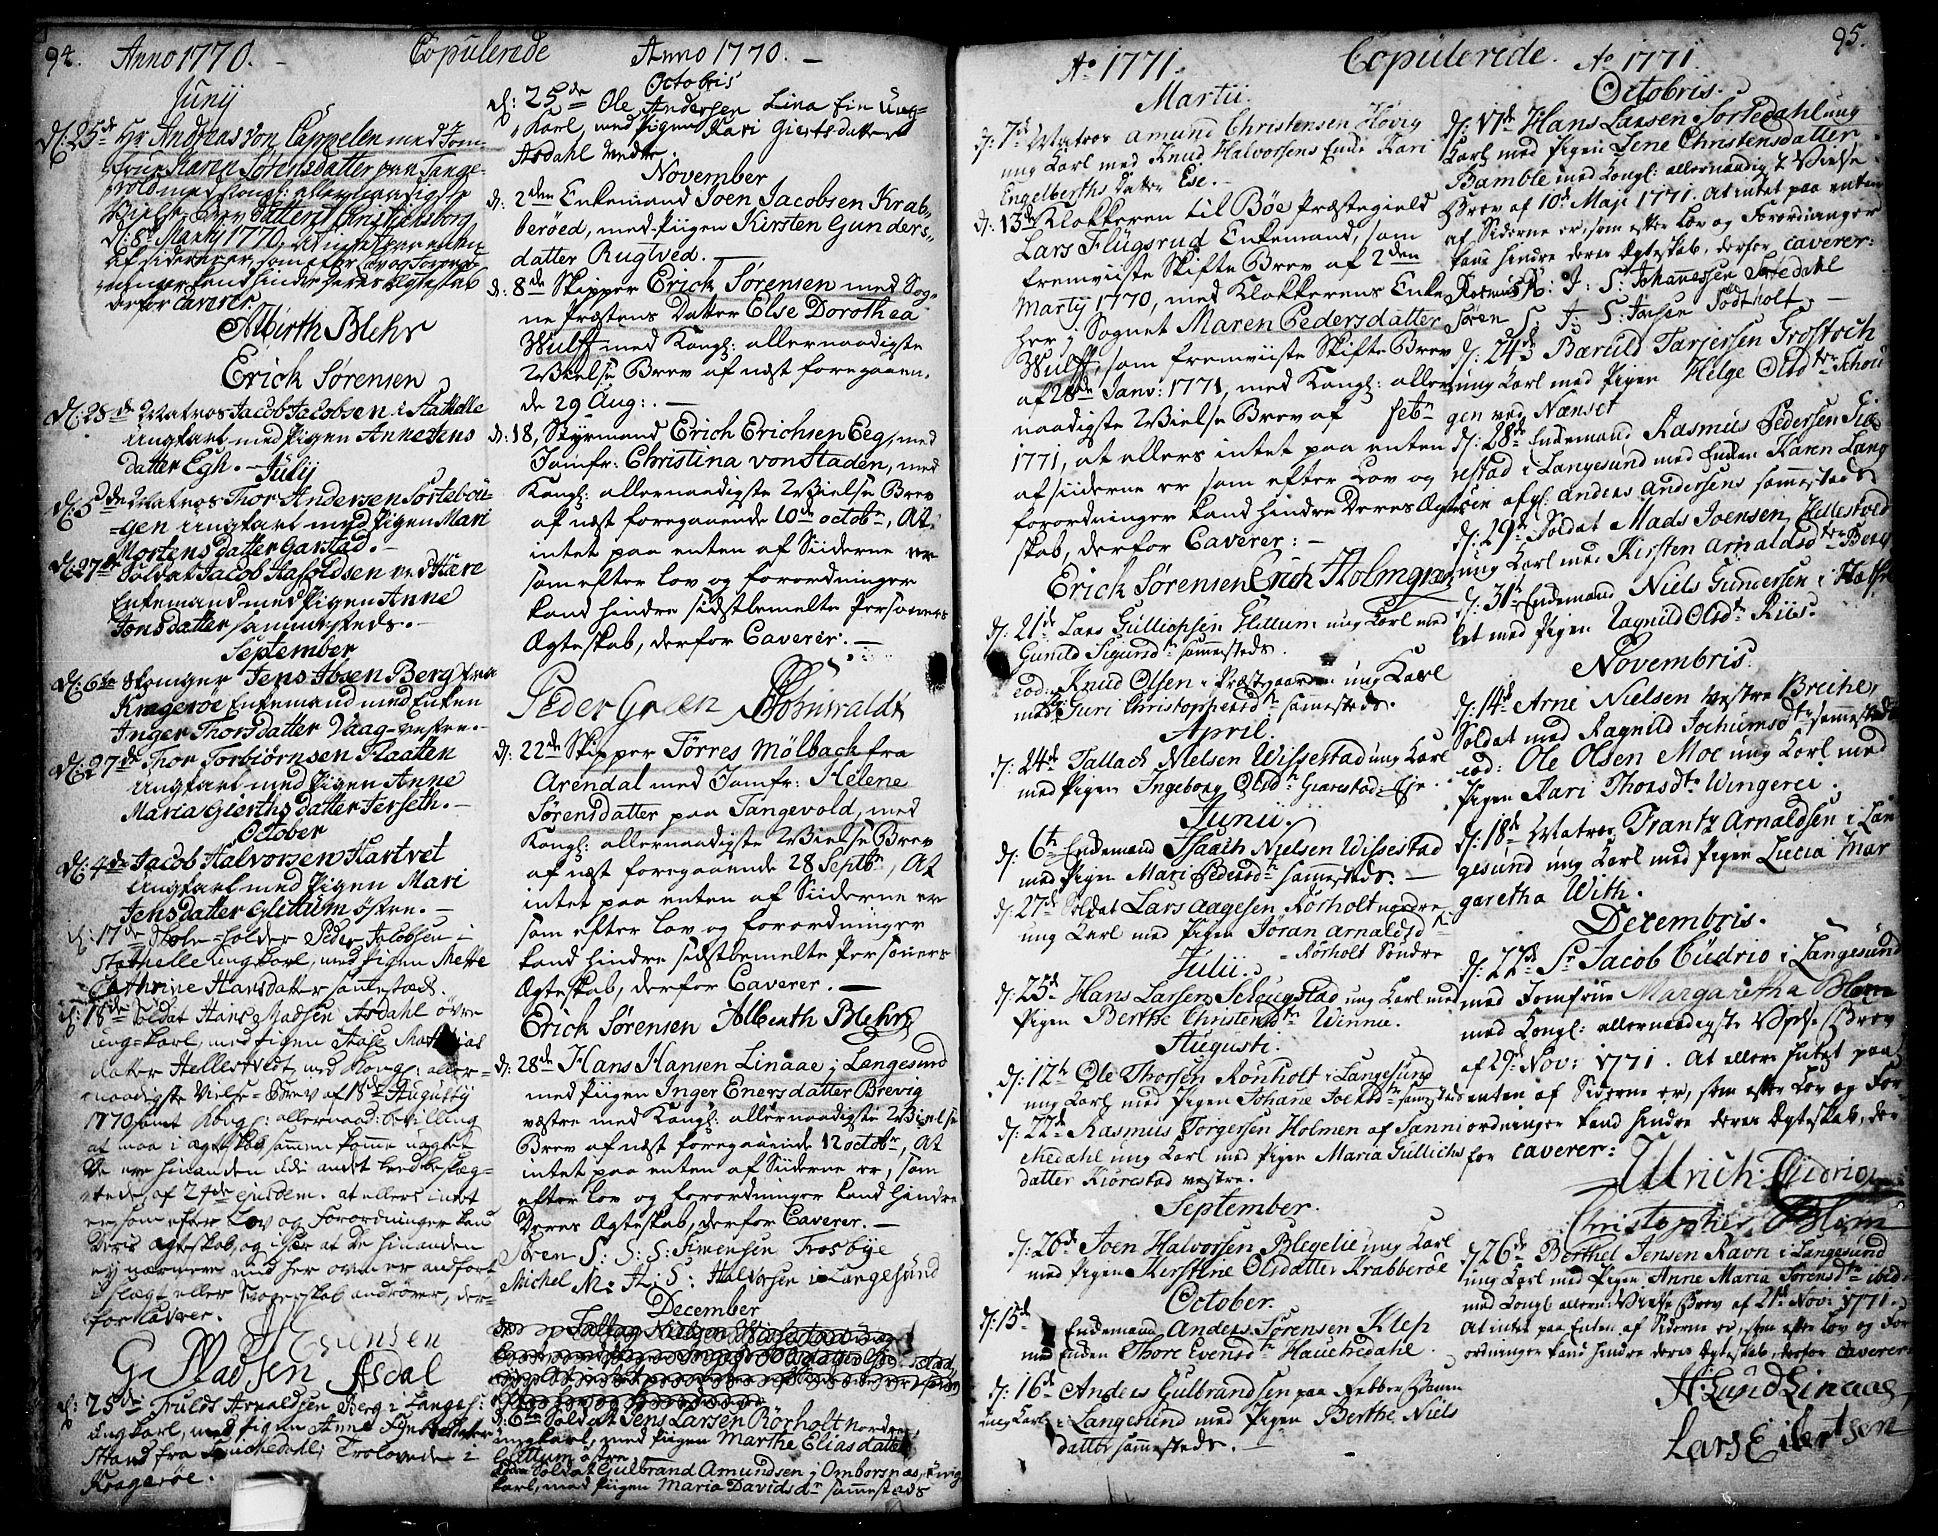 SAKO, Bamble kirkebøker, F/Fa/L0001: Ministerialbok nr. I 1, 1702-1774, s. 94-95